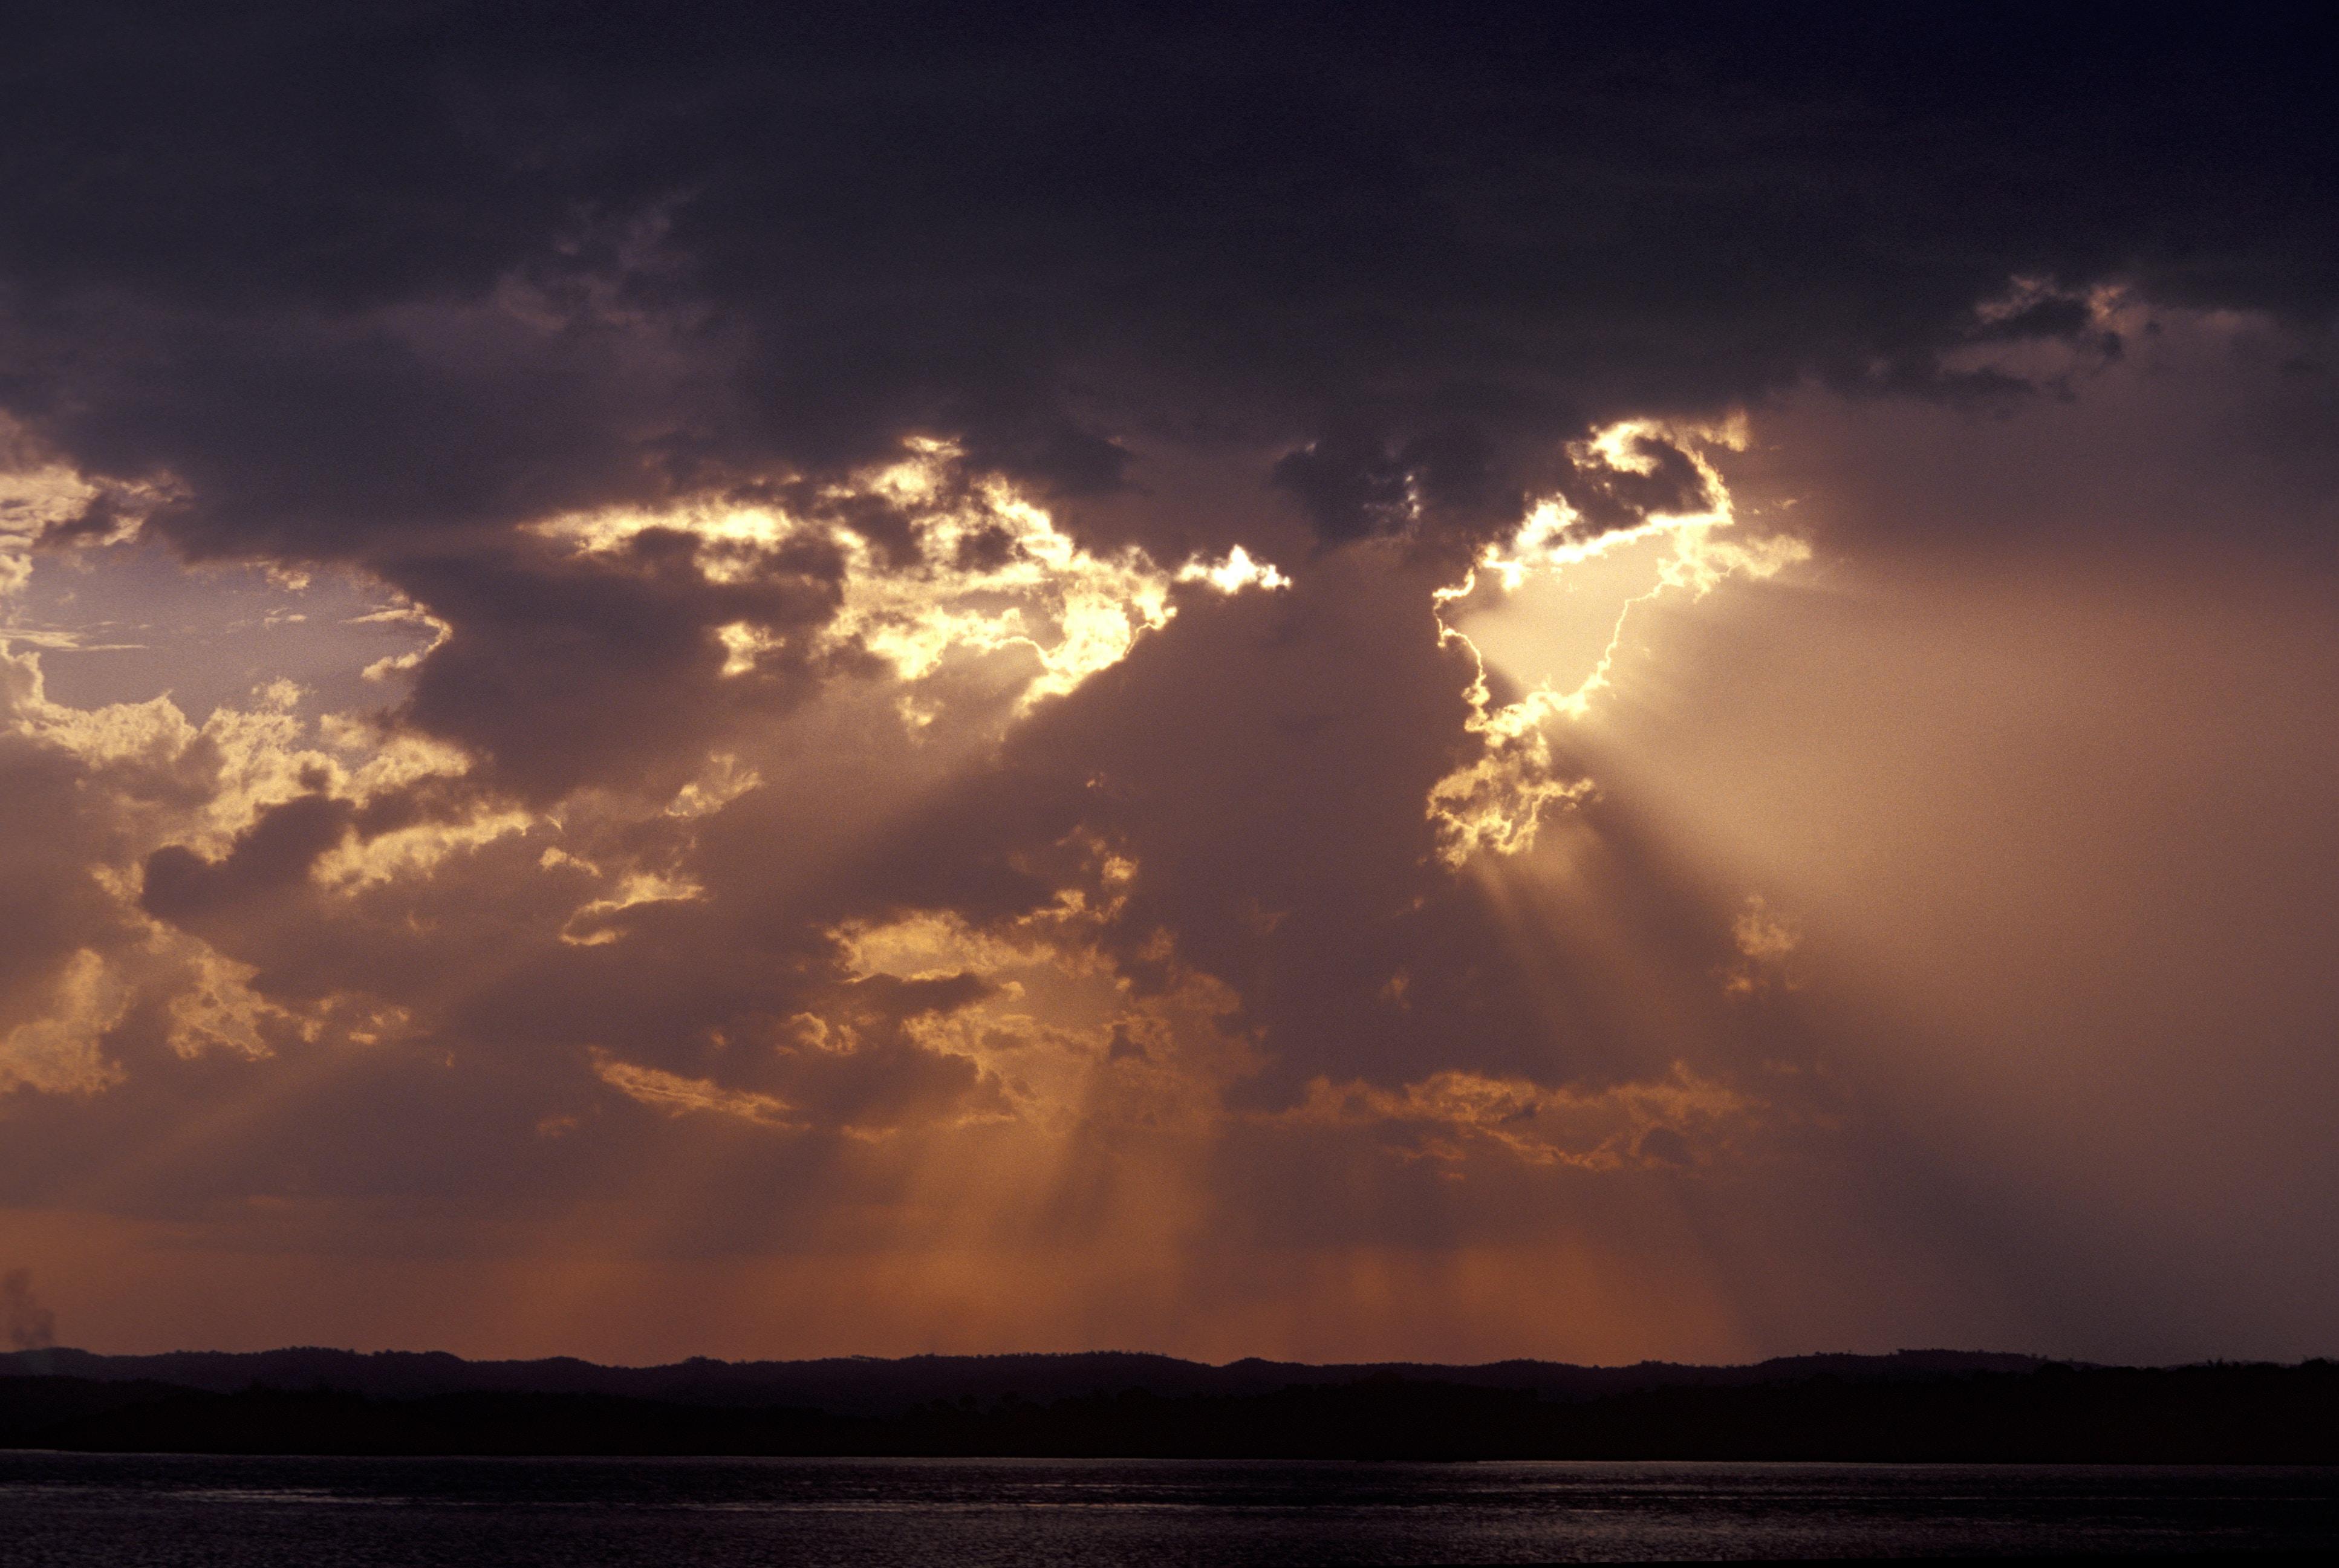 clouds during orange sunset